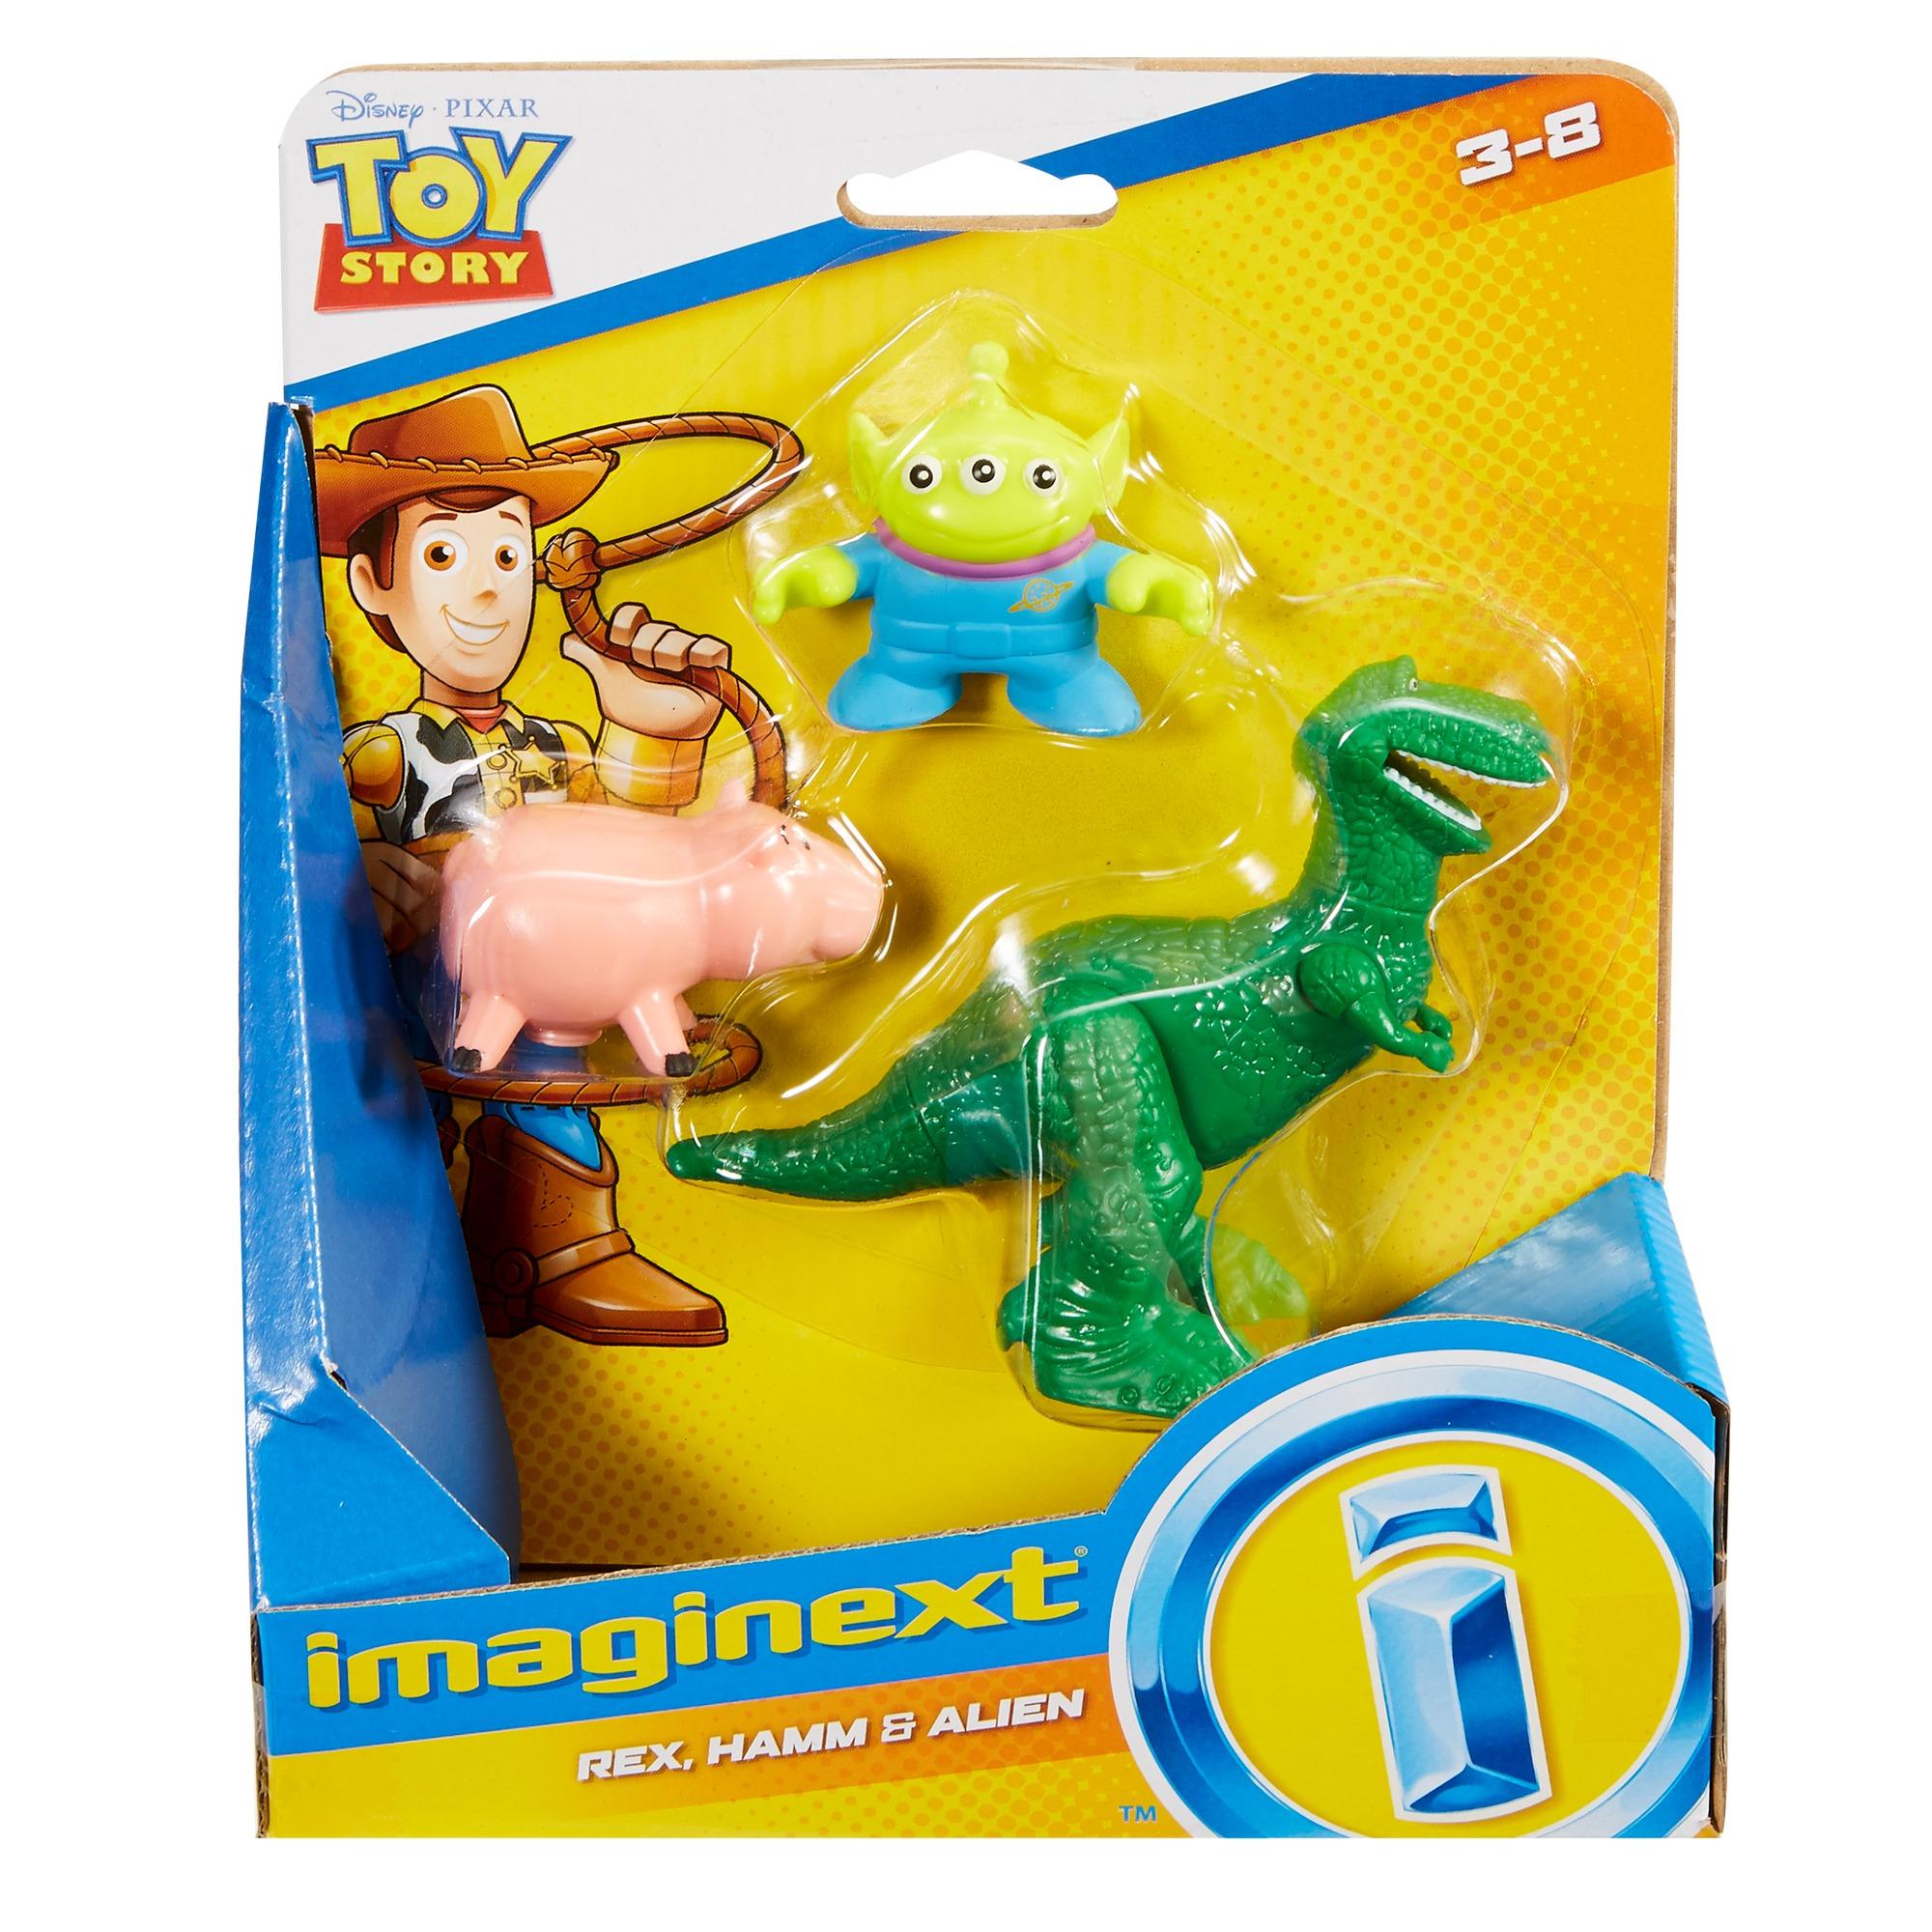 Ham /& Alien Fisher-Price Imaginext Toy Story Rex